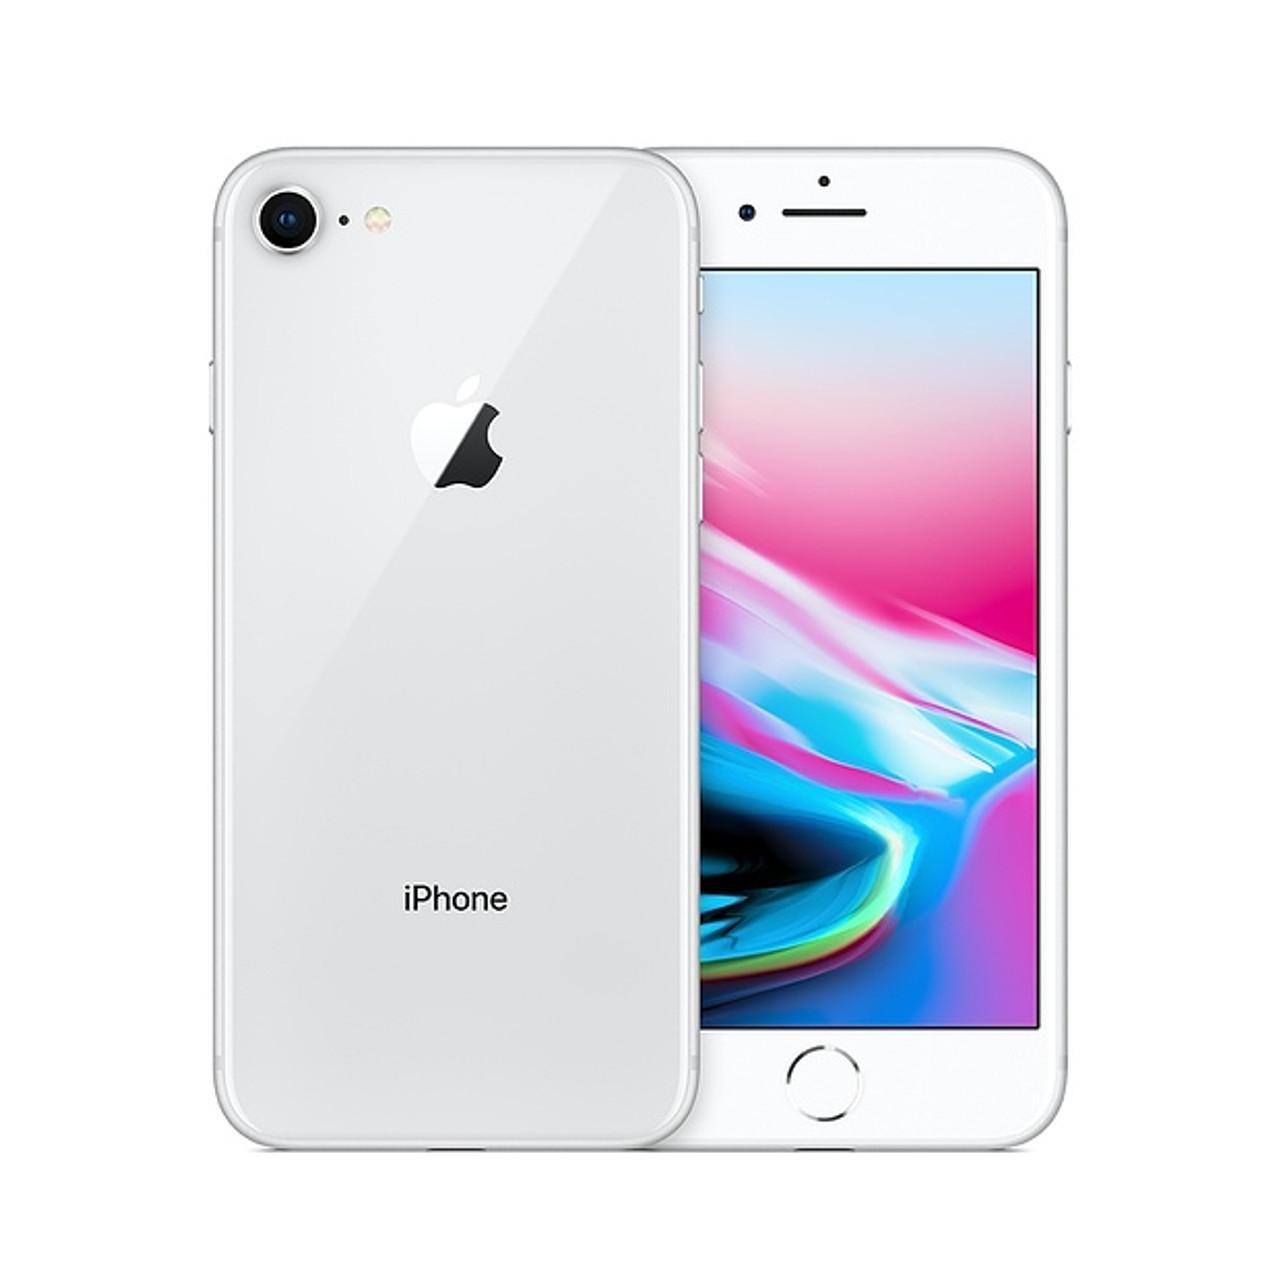 Apple iPhone 8 (Unlocked) 64GB - Silver MQ6W2LL A  6386325c0f